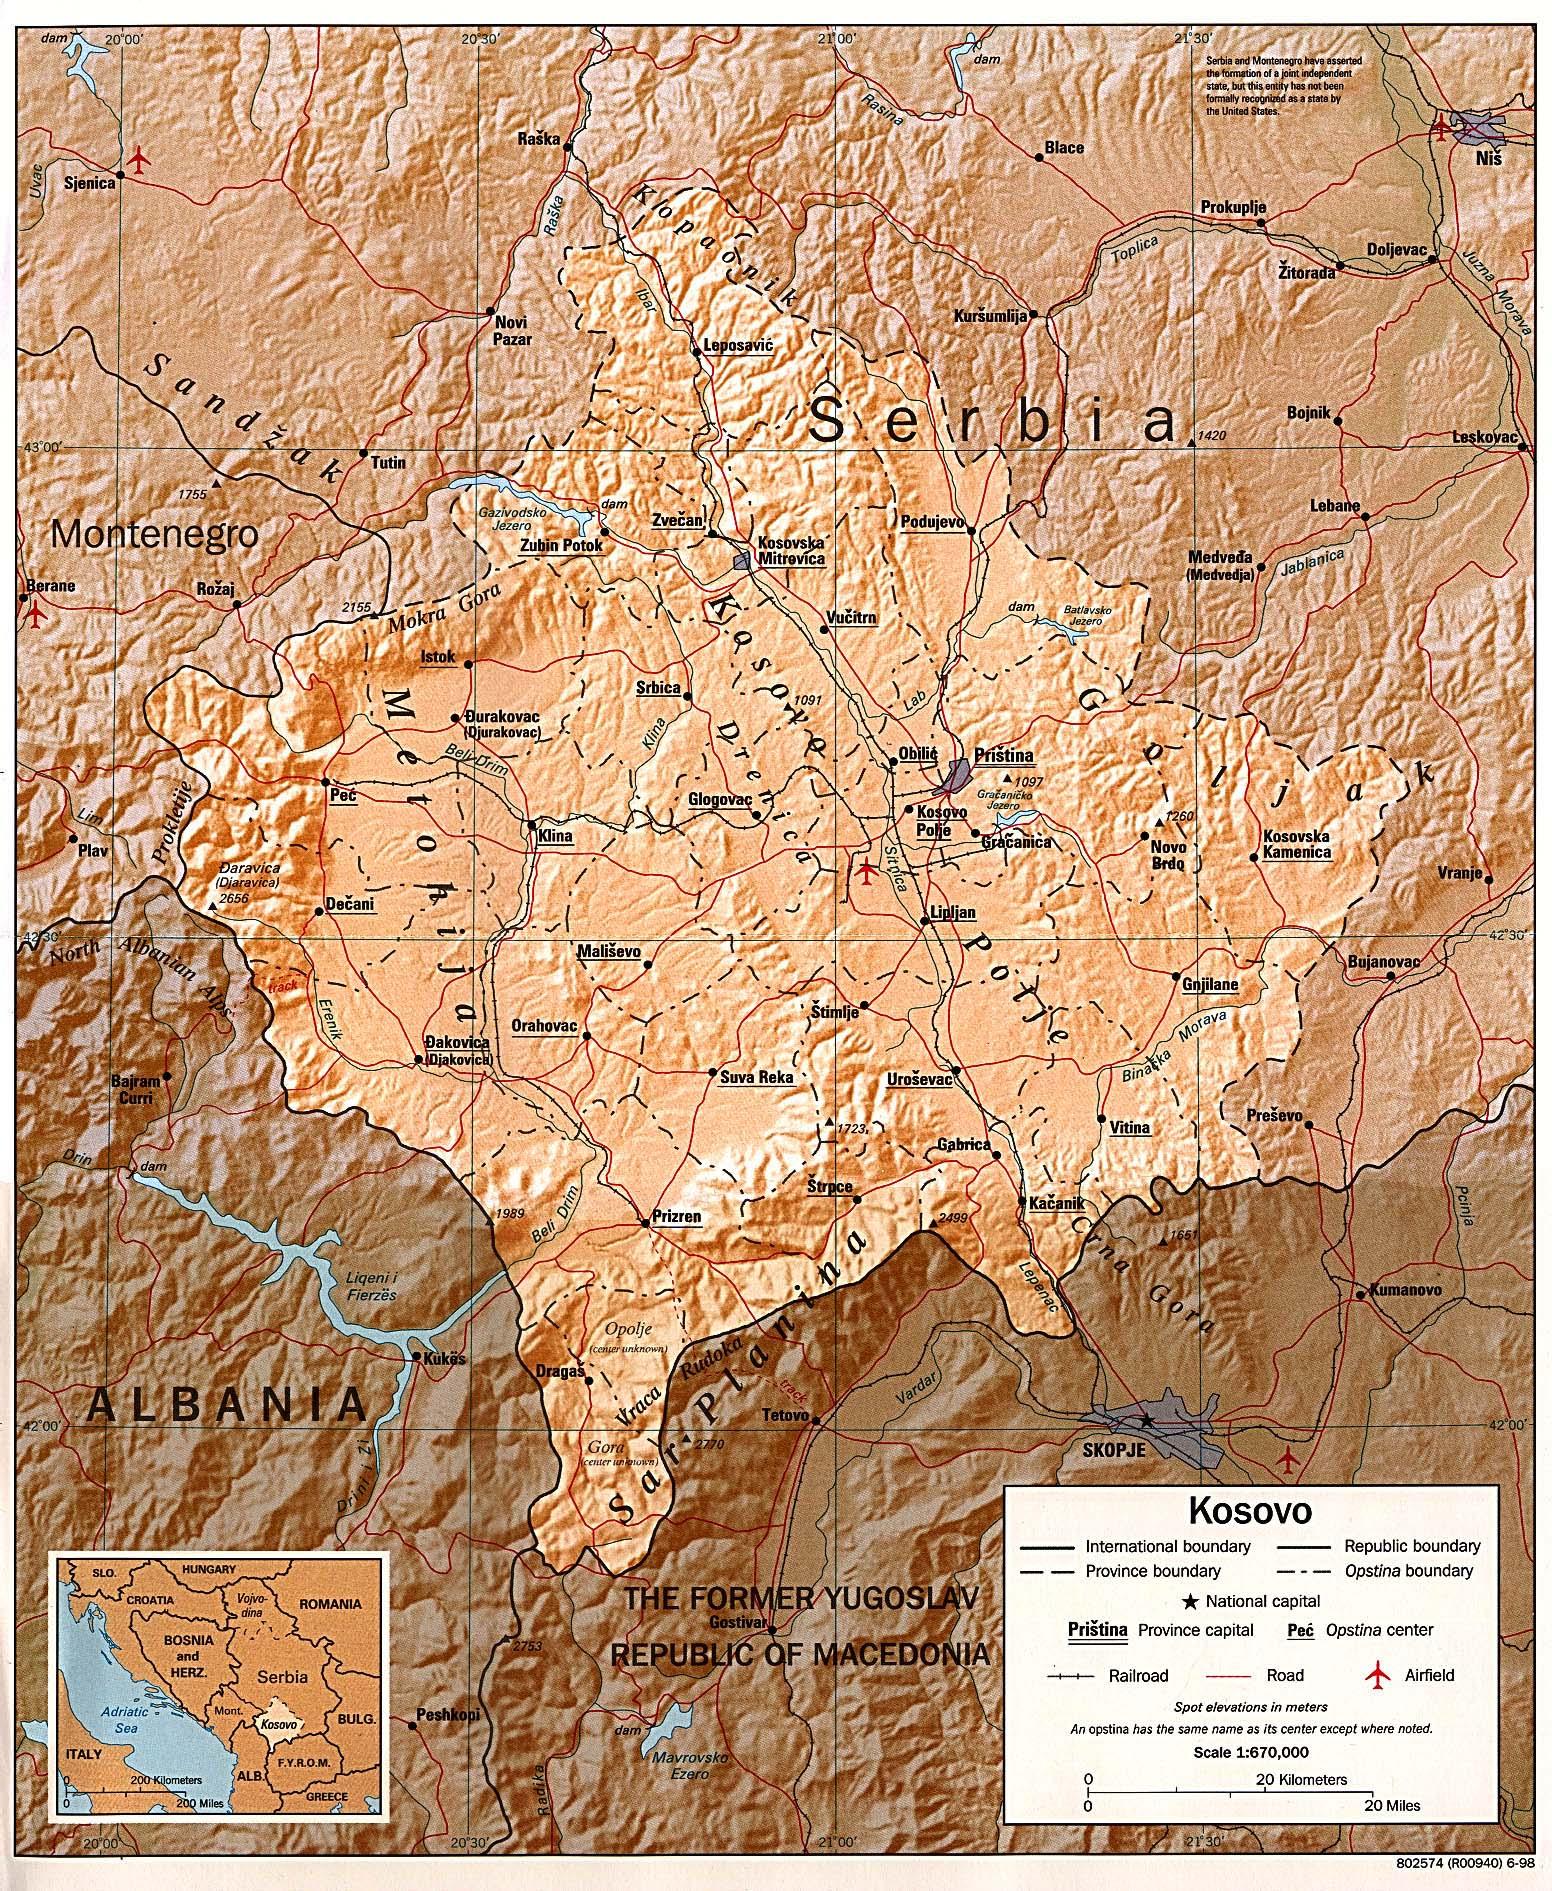 Kosovo Maps PerryCastañeda Map Collection UT Library Online - Kosovo map